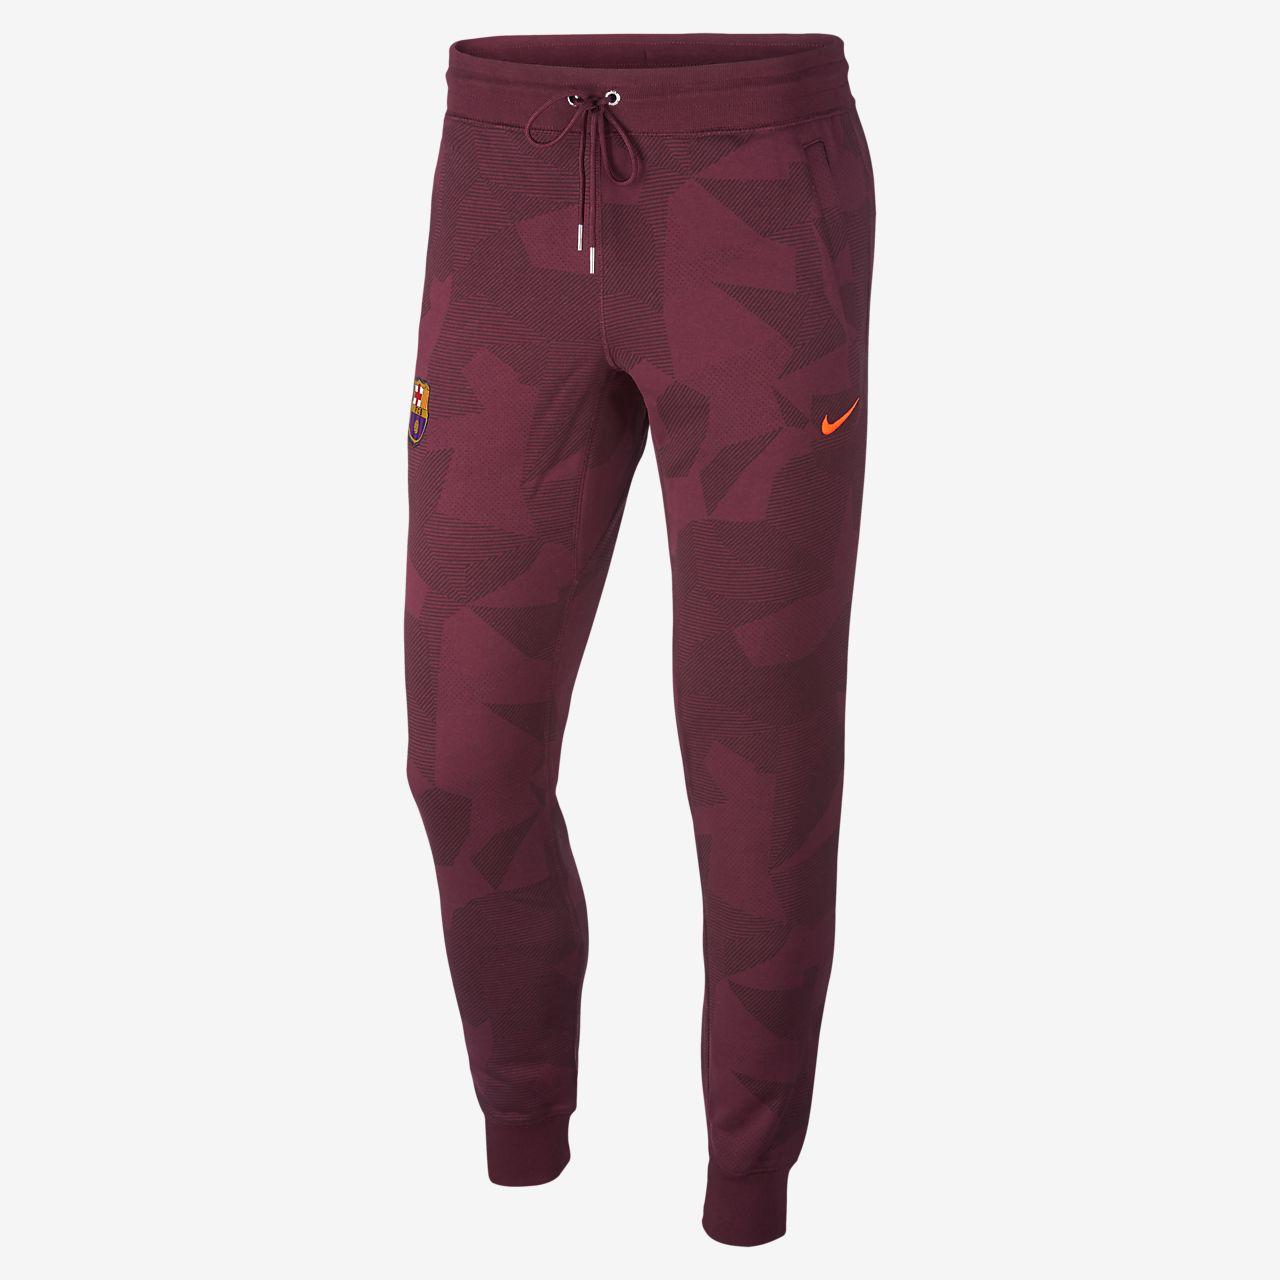 FC Barcelona Men's Pants